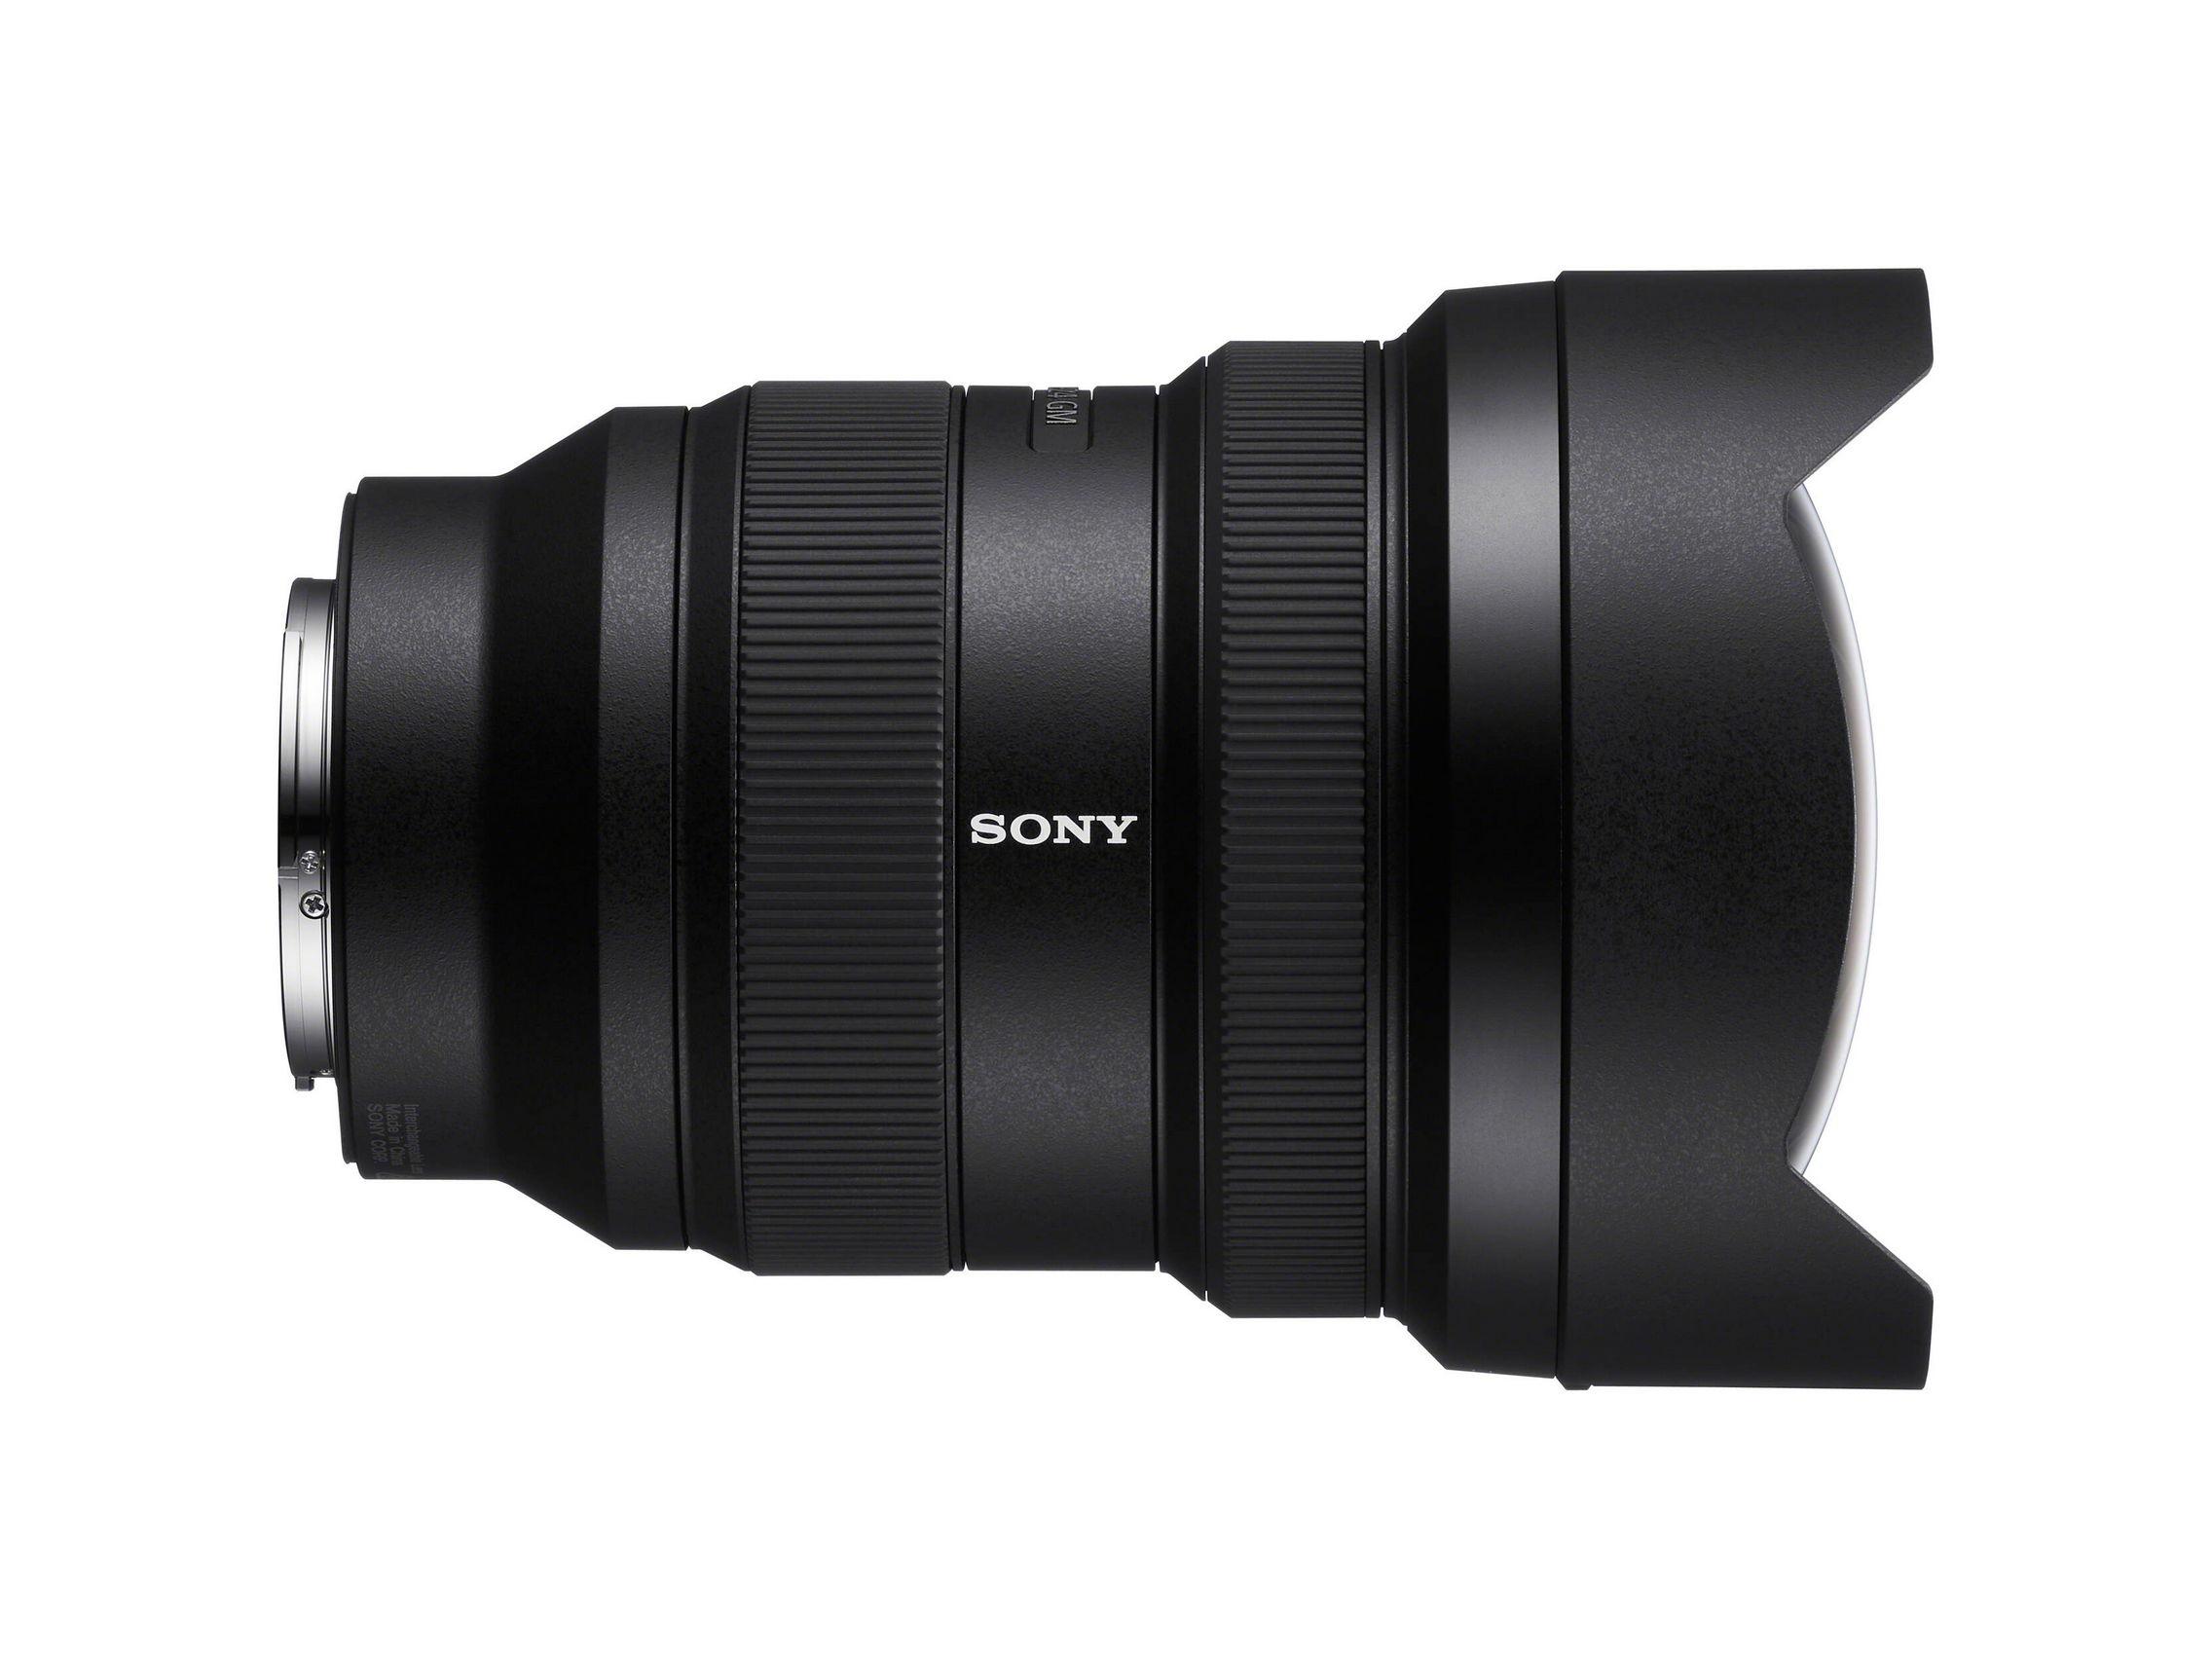 Sony FE 2.8/12-24 G GM (SEL1224GM)